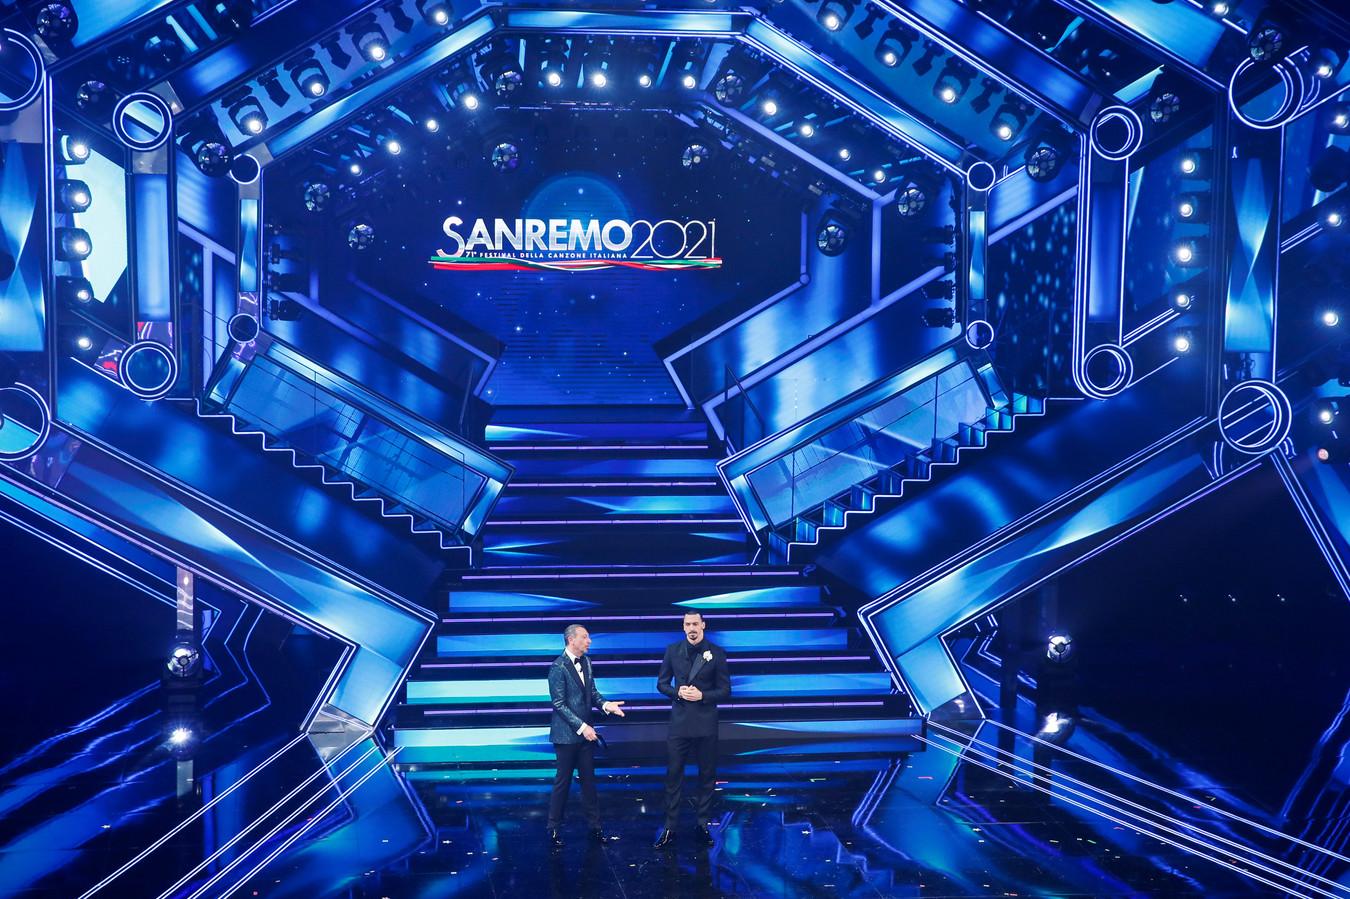 Zlatan Ibrahimovic en Amadeus op het Sanremo Music Festival.